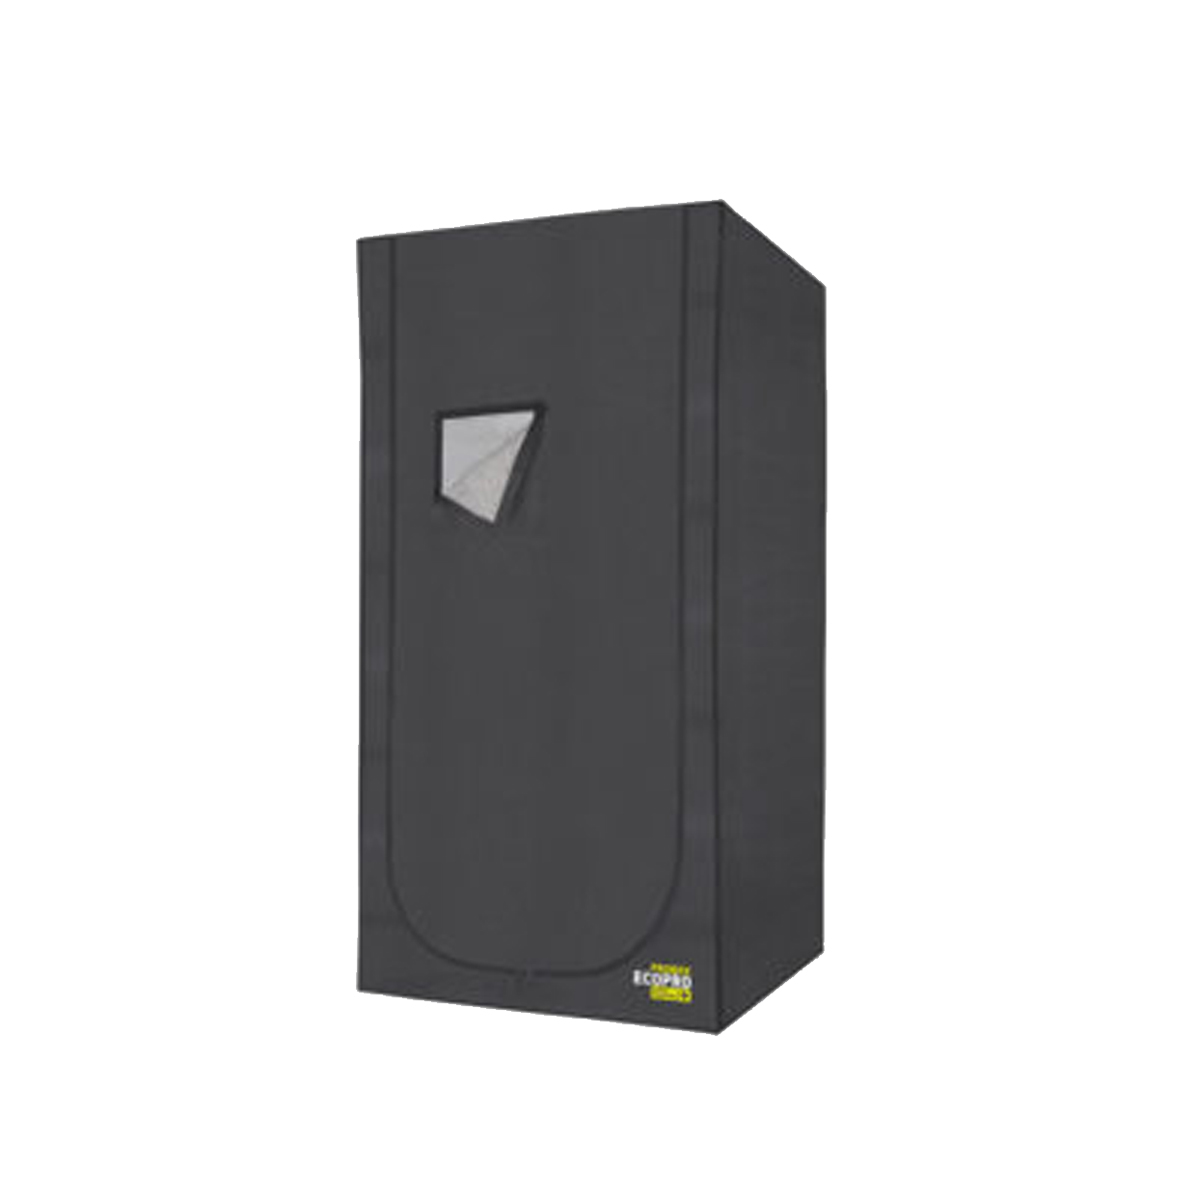 Estufa Pro Box Eco Pro 40 - 40x40x140 cm